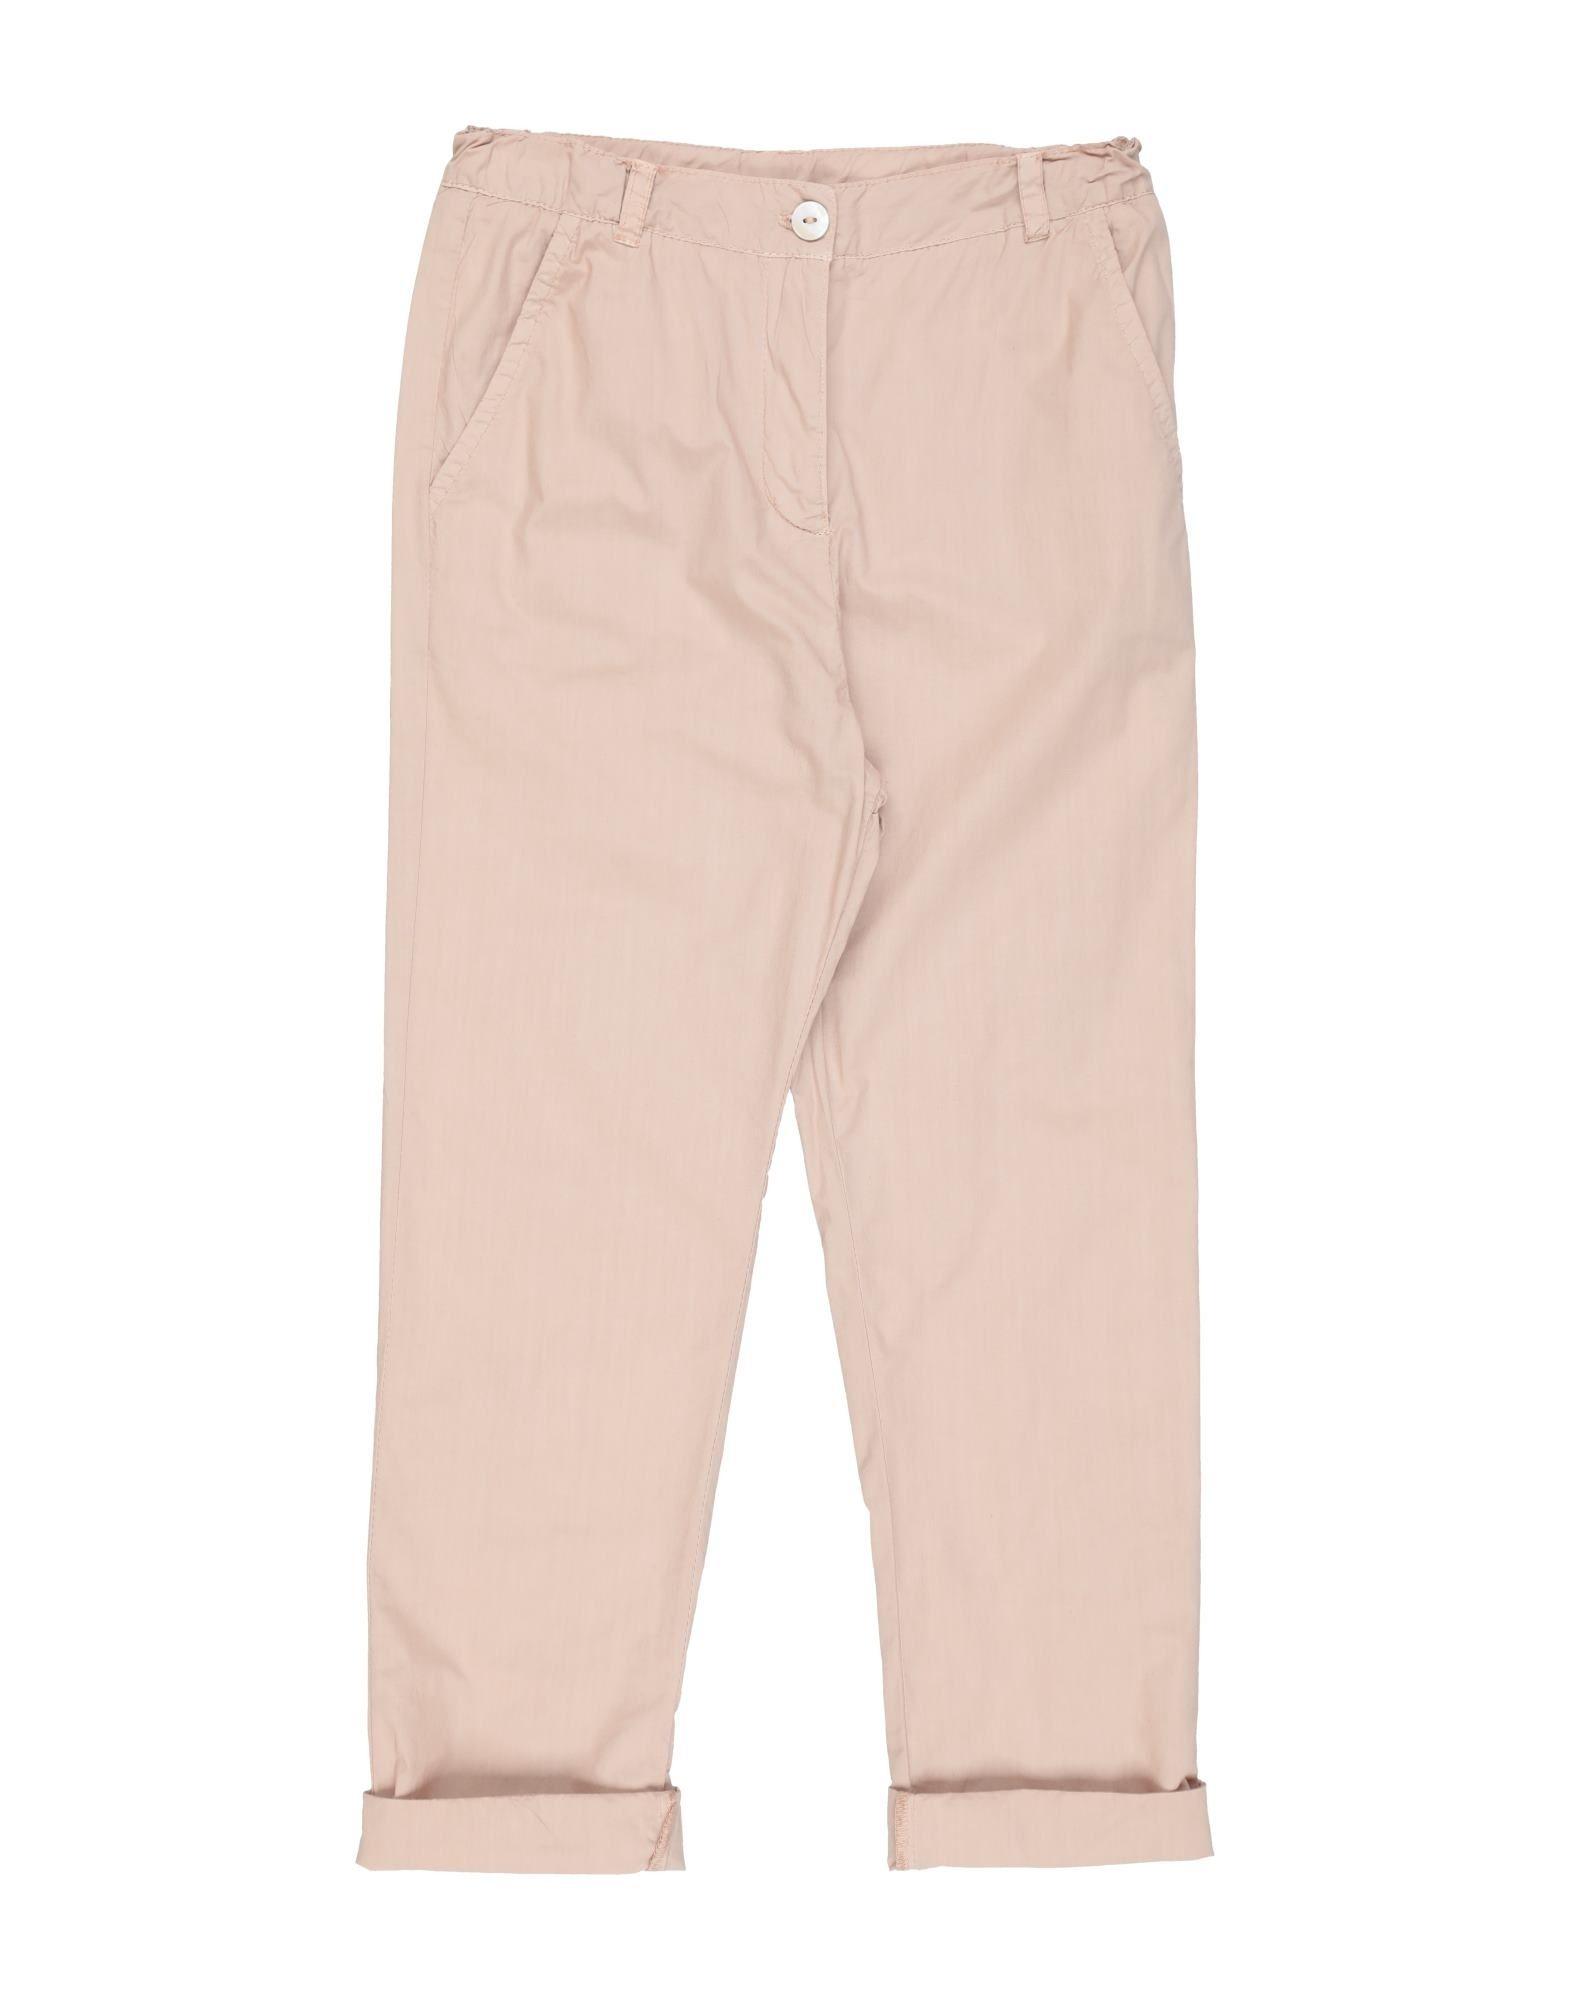 Yellowsub Kids' Casual Pants In Pastel Pink